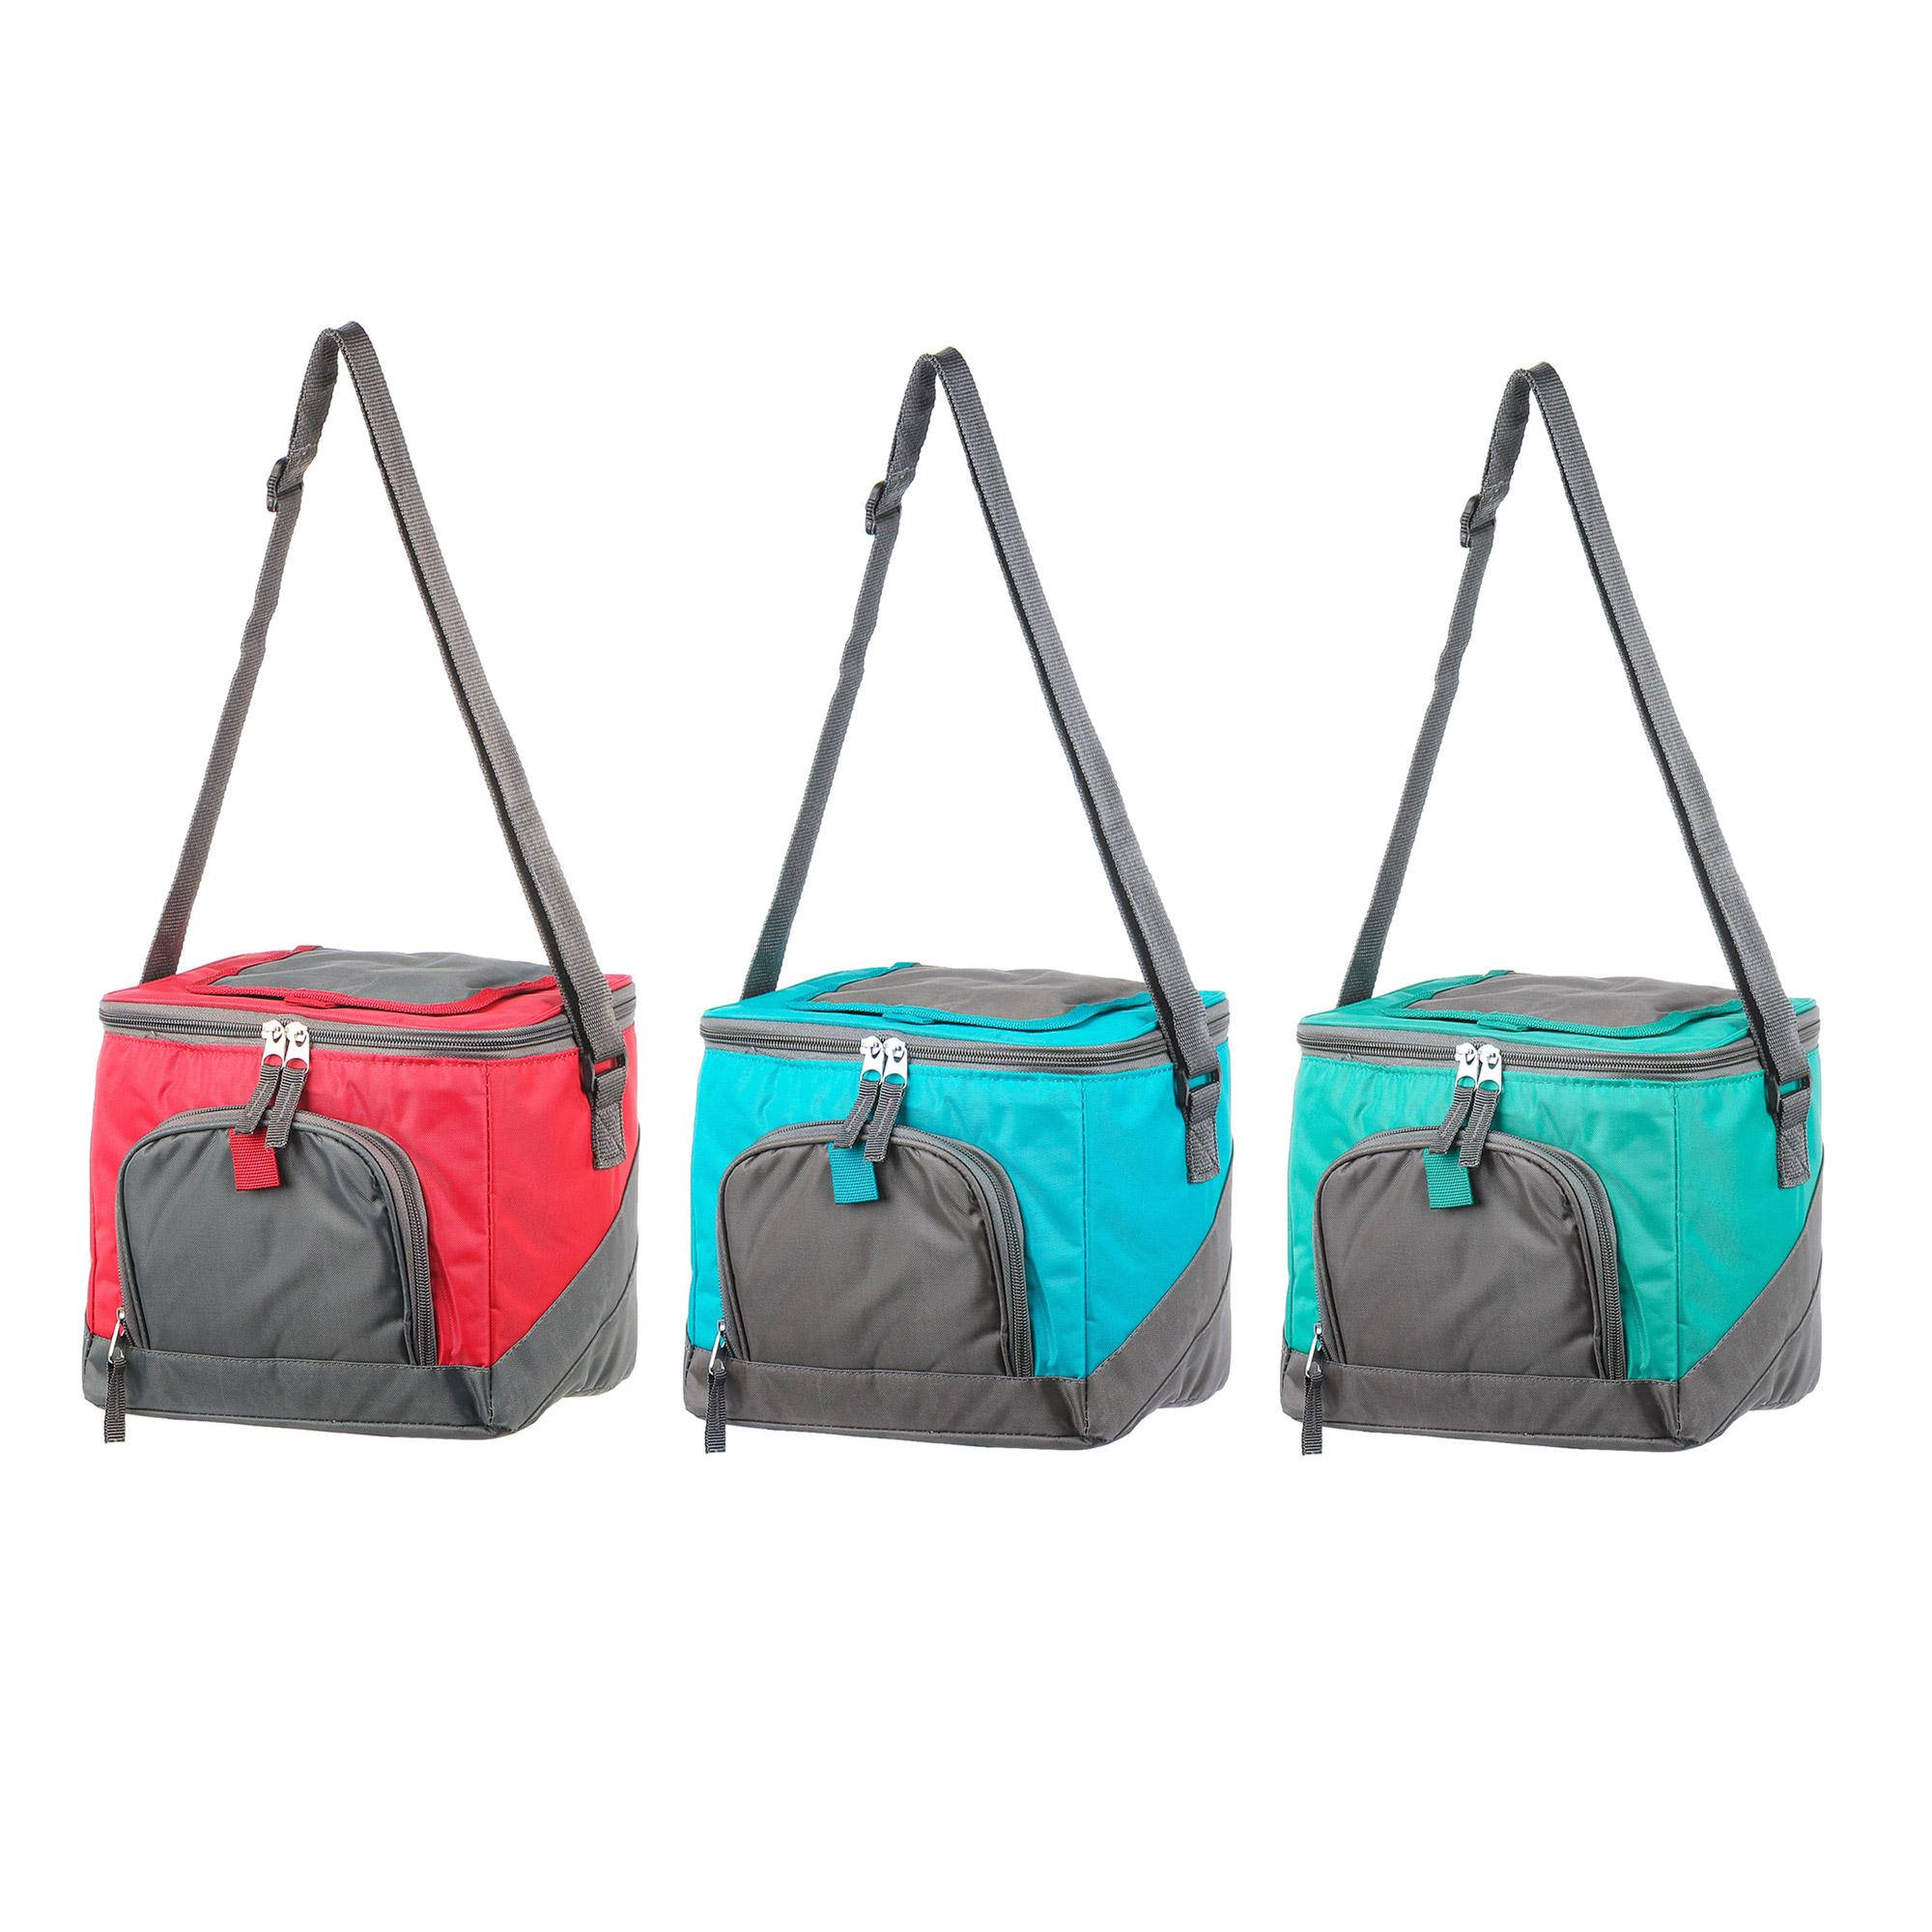 Фото - Сумка-холодильник Koopman camping объем 8 л 21,5x17,5x22 см сумка холодильник koopman синяя 26х13х25 см